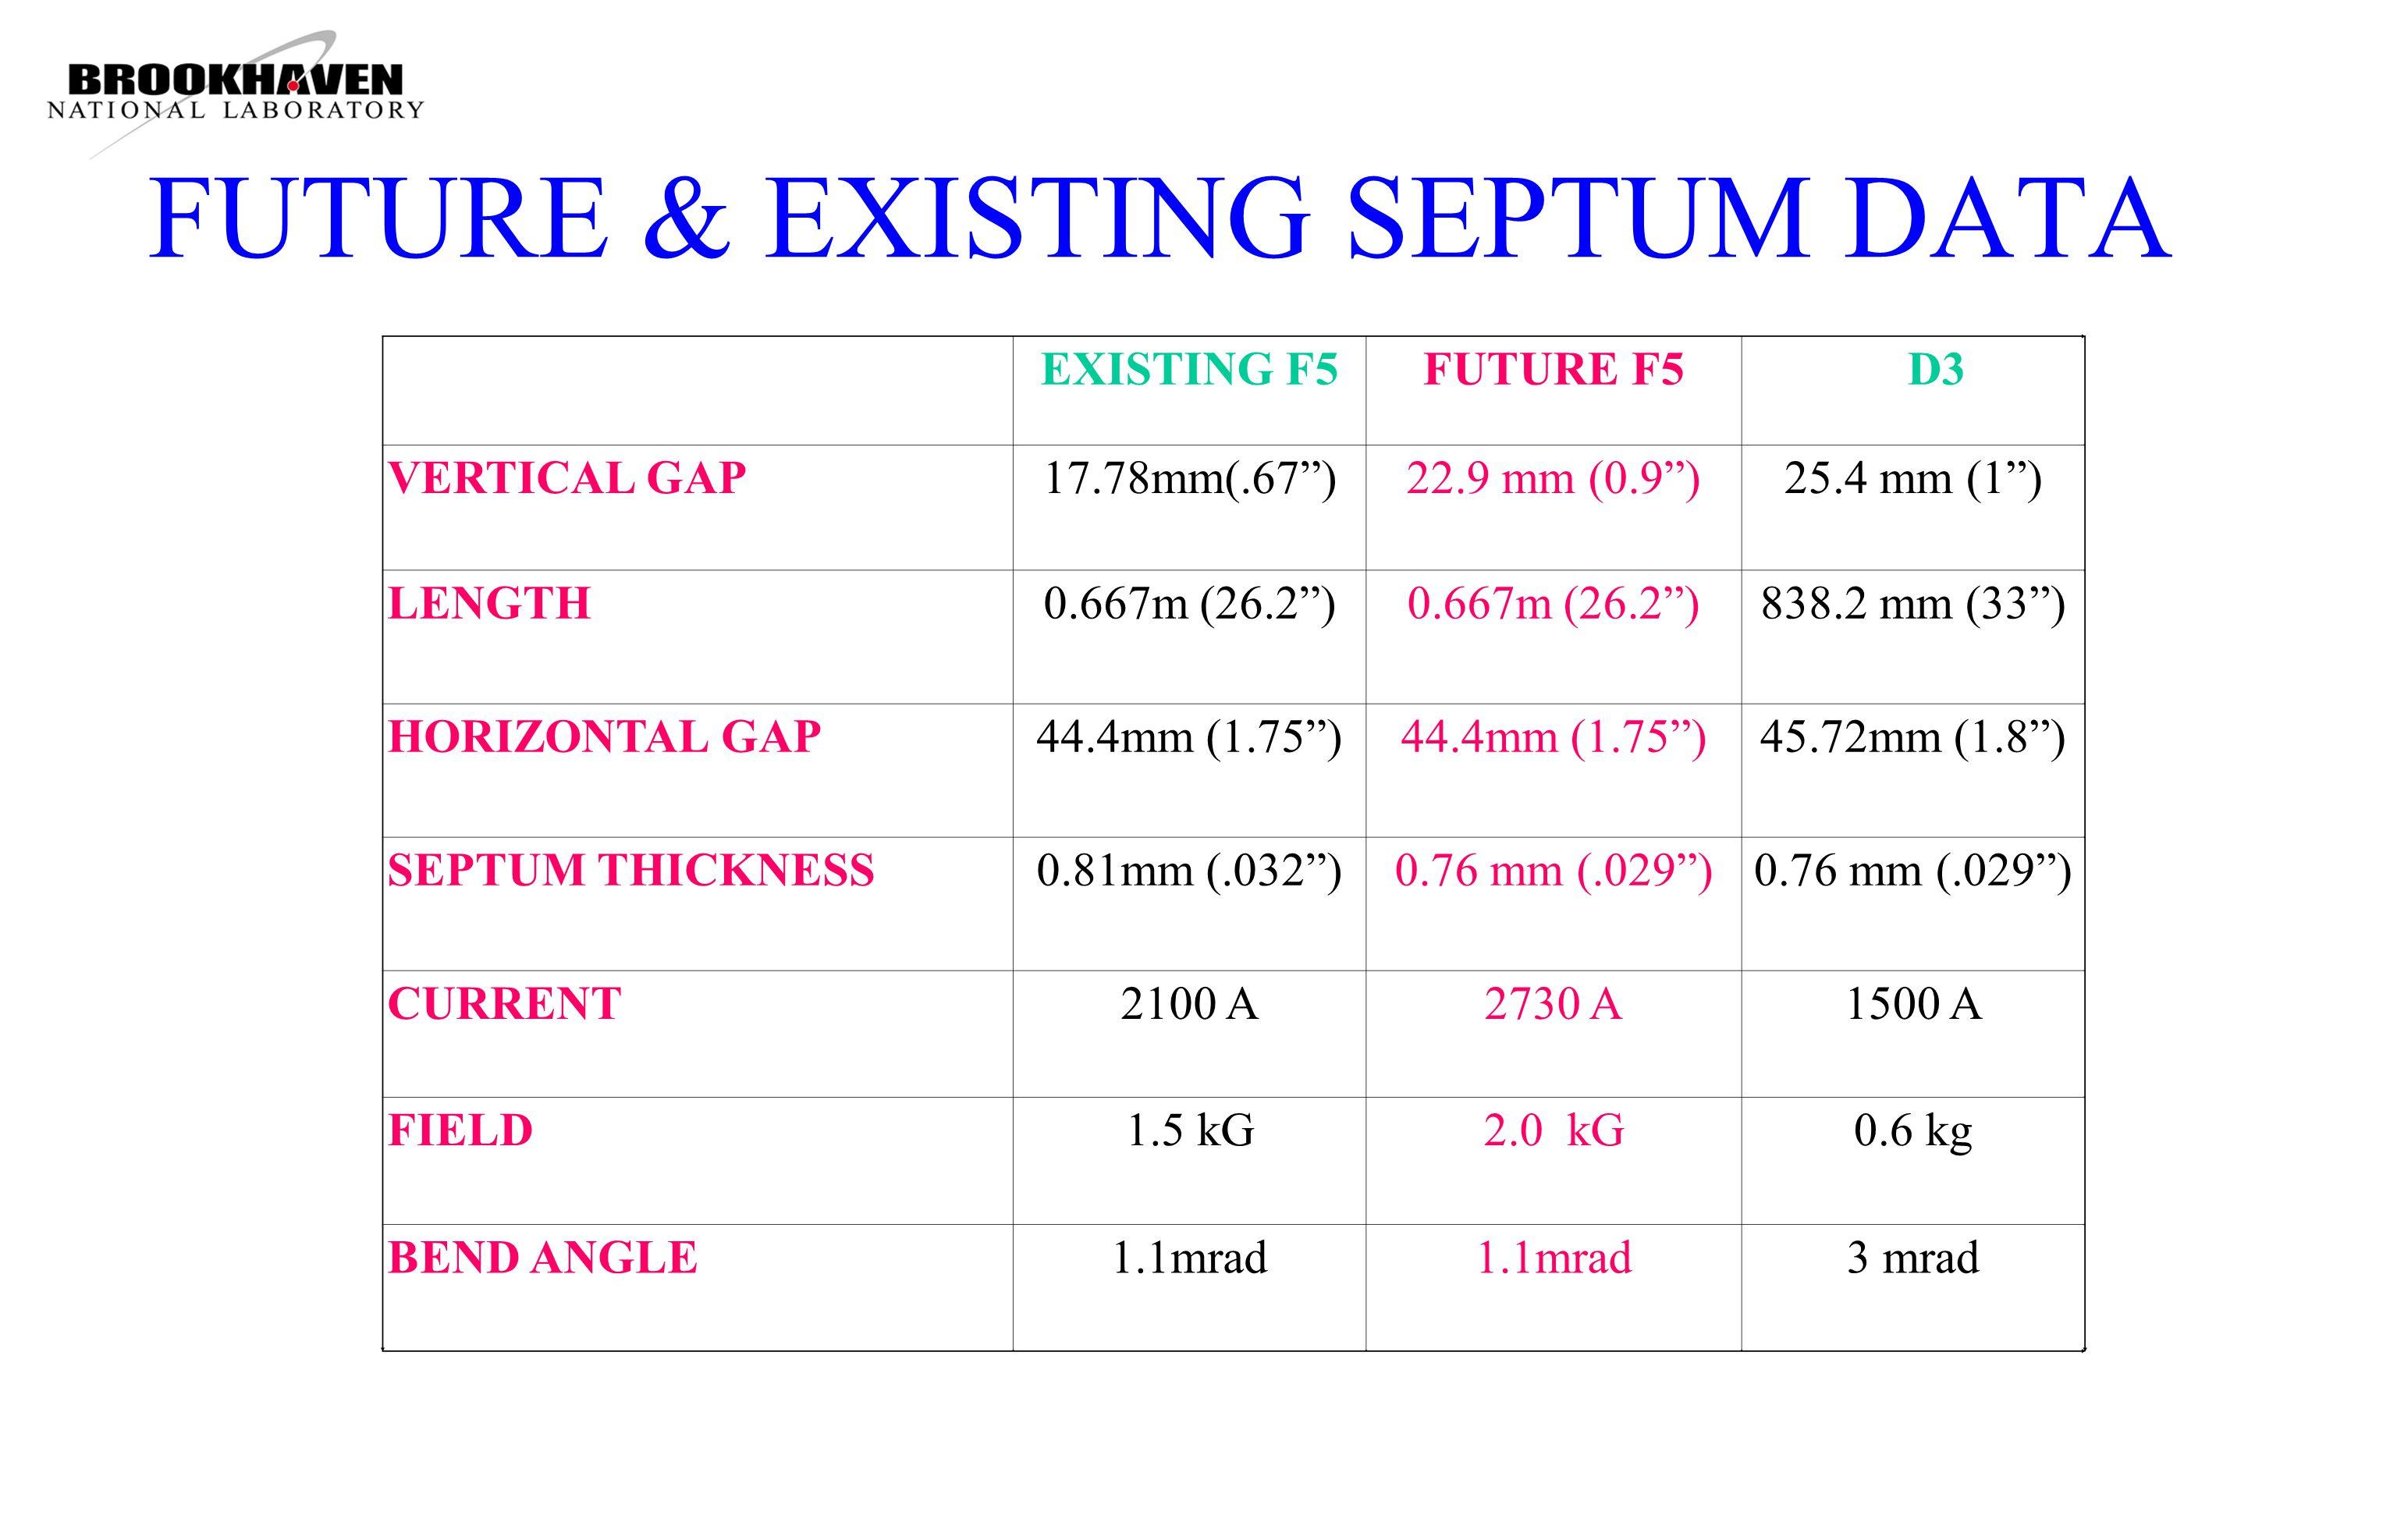 FUTURE & EXISTING SEPTUM DATA EXISTING F5FUTURE F5 D3 VERTICAL GAP17.78mm(.67 )22.9 mm (0.9 )25.4 mm (1 ) LENGTH0.667m (26.2 ) 838.2 mm (33 ) HORIZONTAL GAP44.4mm (1.75 ) 45.72mm (1.8 ) SEPTUM THICKNESS0.81mm (.032 )0.76 mm (.029 ) CURRENT2100 A2730 A1500 A FIELD1.5 kG2.0 kG0.6 kg BEND ANGLE1.1mrad 3 mrad